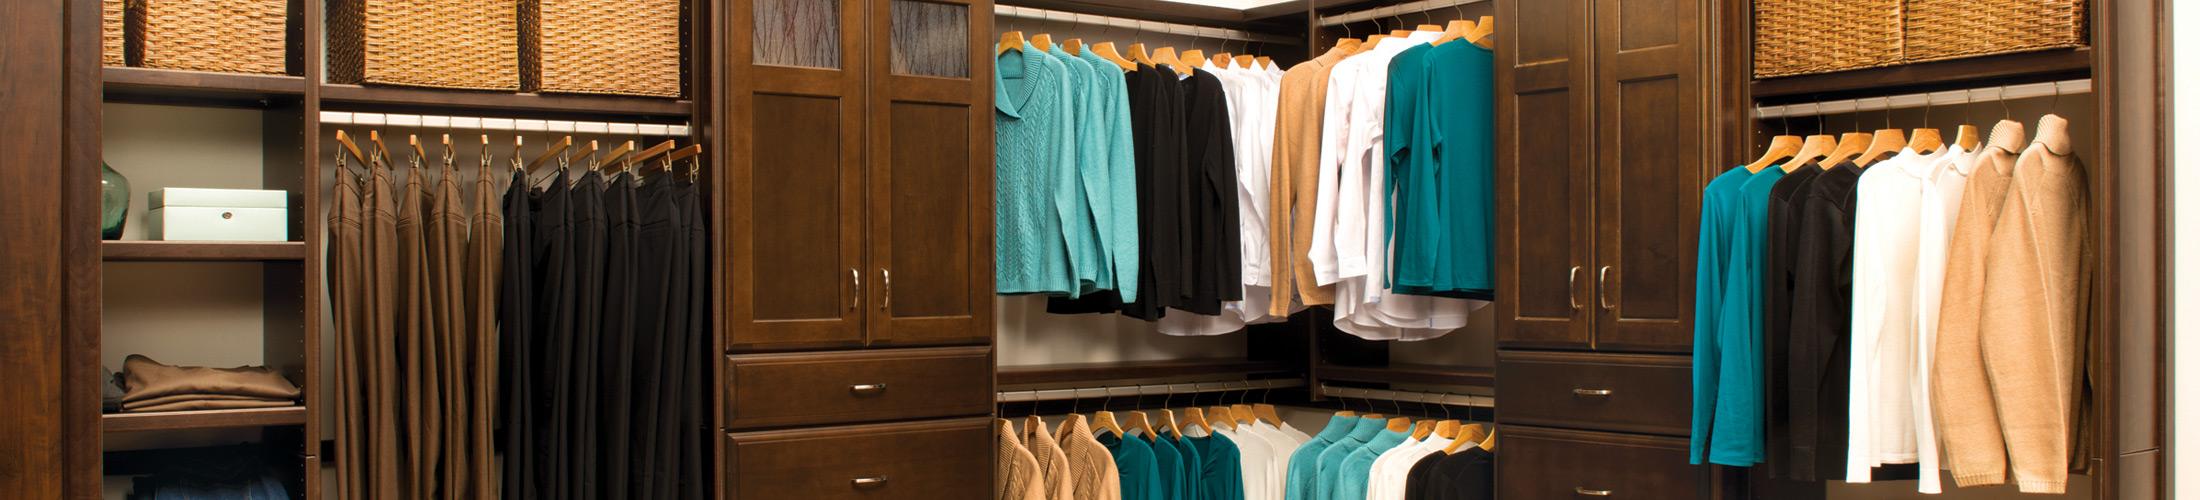 Exceptional Home U003e Products U003e Real Closet